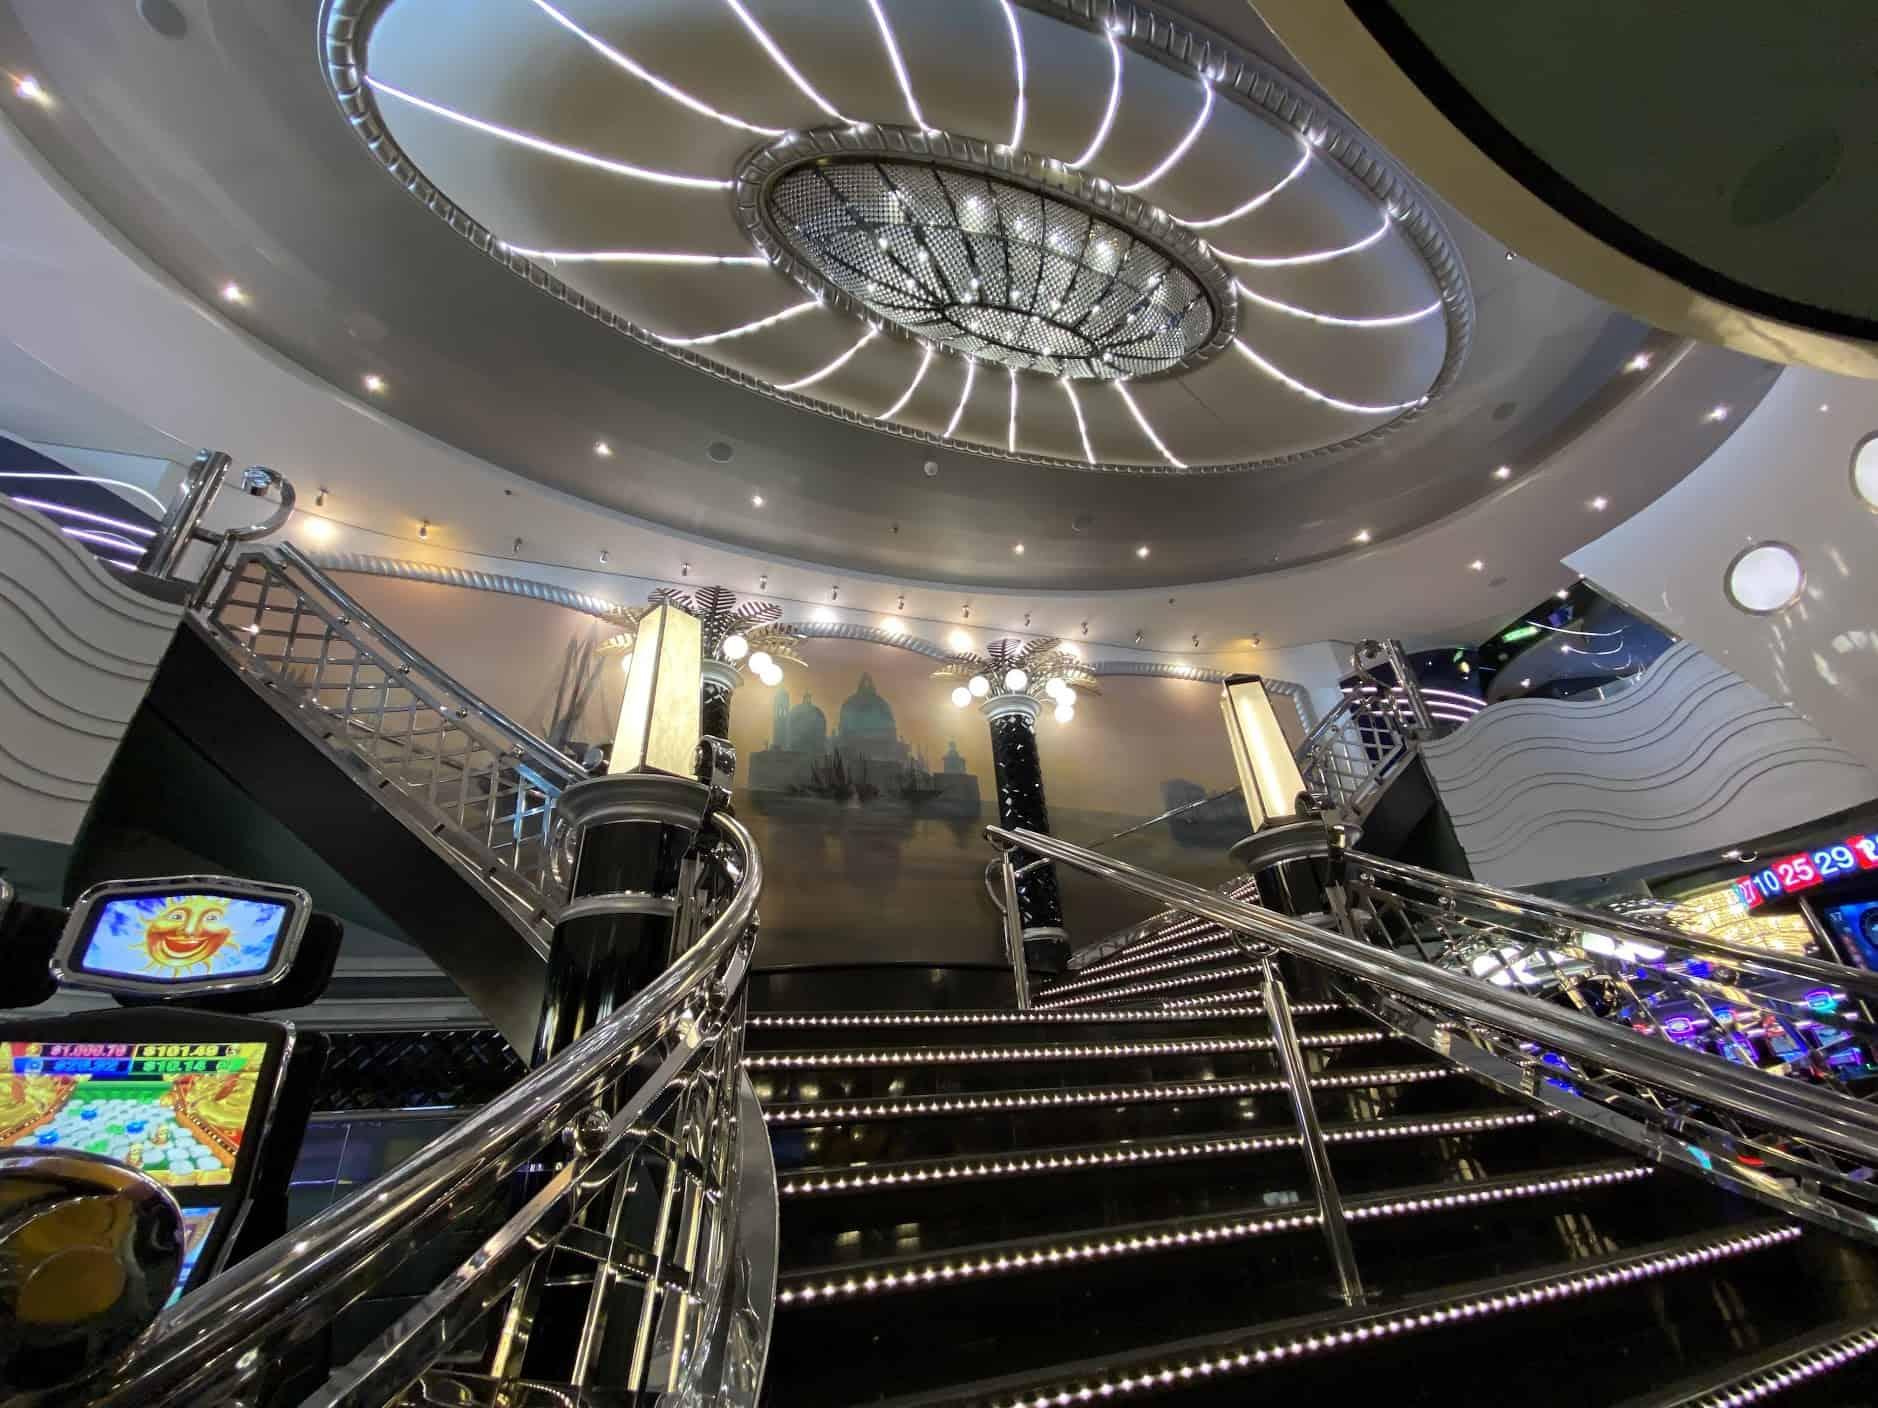 grand staircase msc divina casino